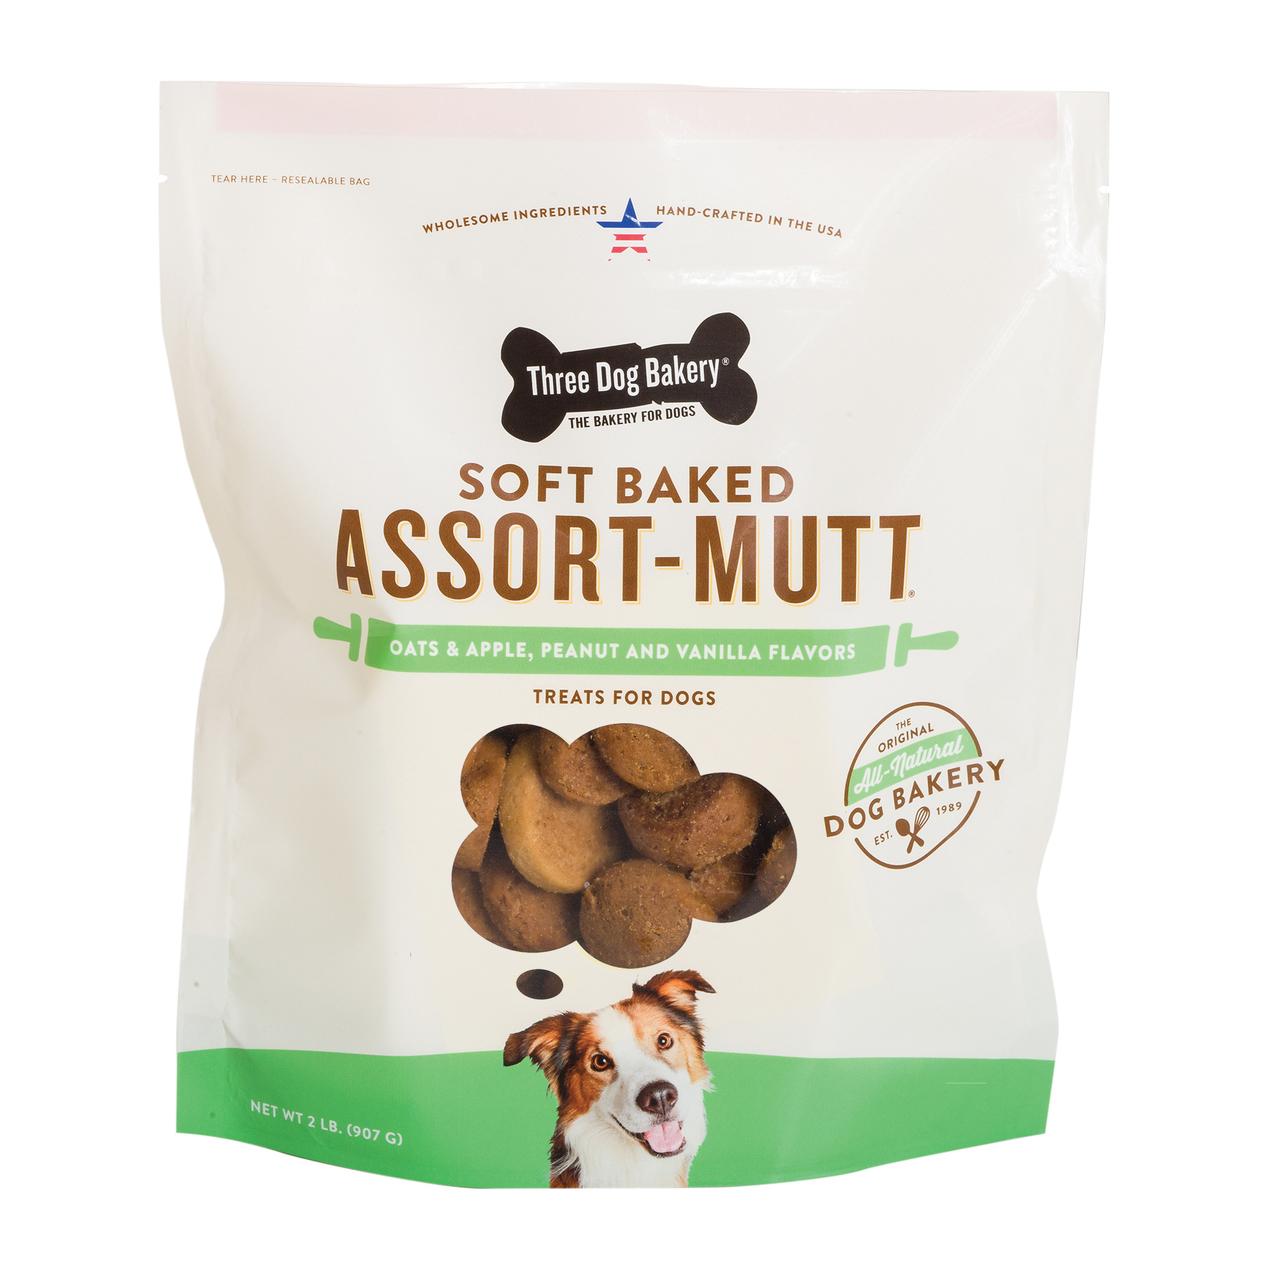 Three Dog Bakery Assort'Mutt' Trio Oats & Apples Peanut Butter & Vanilla , 32-oz